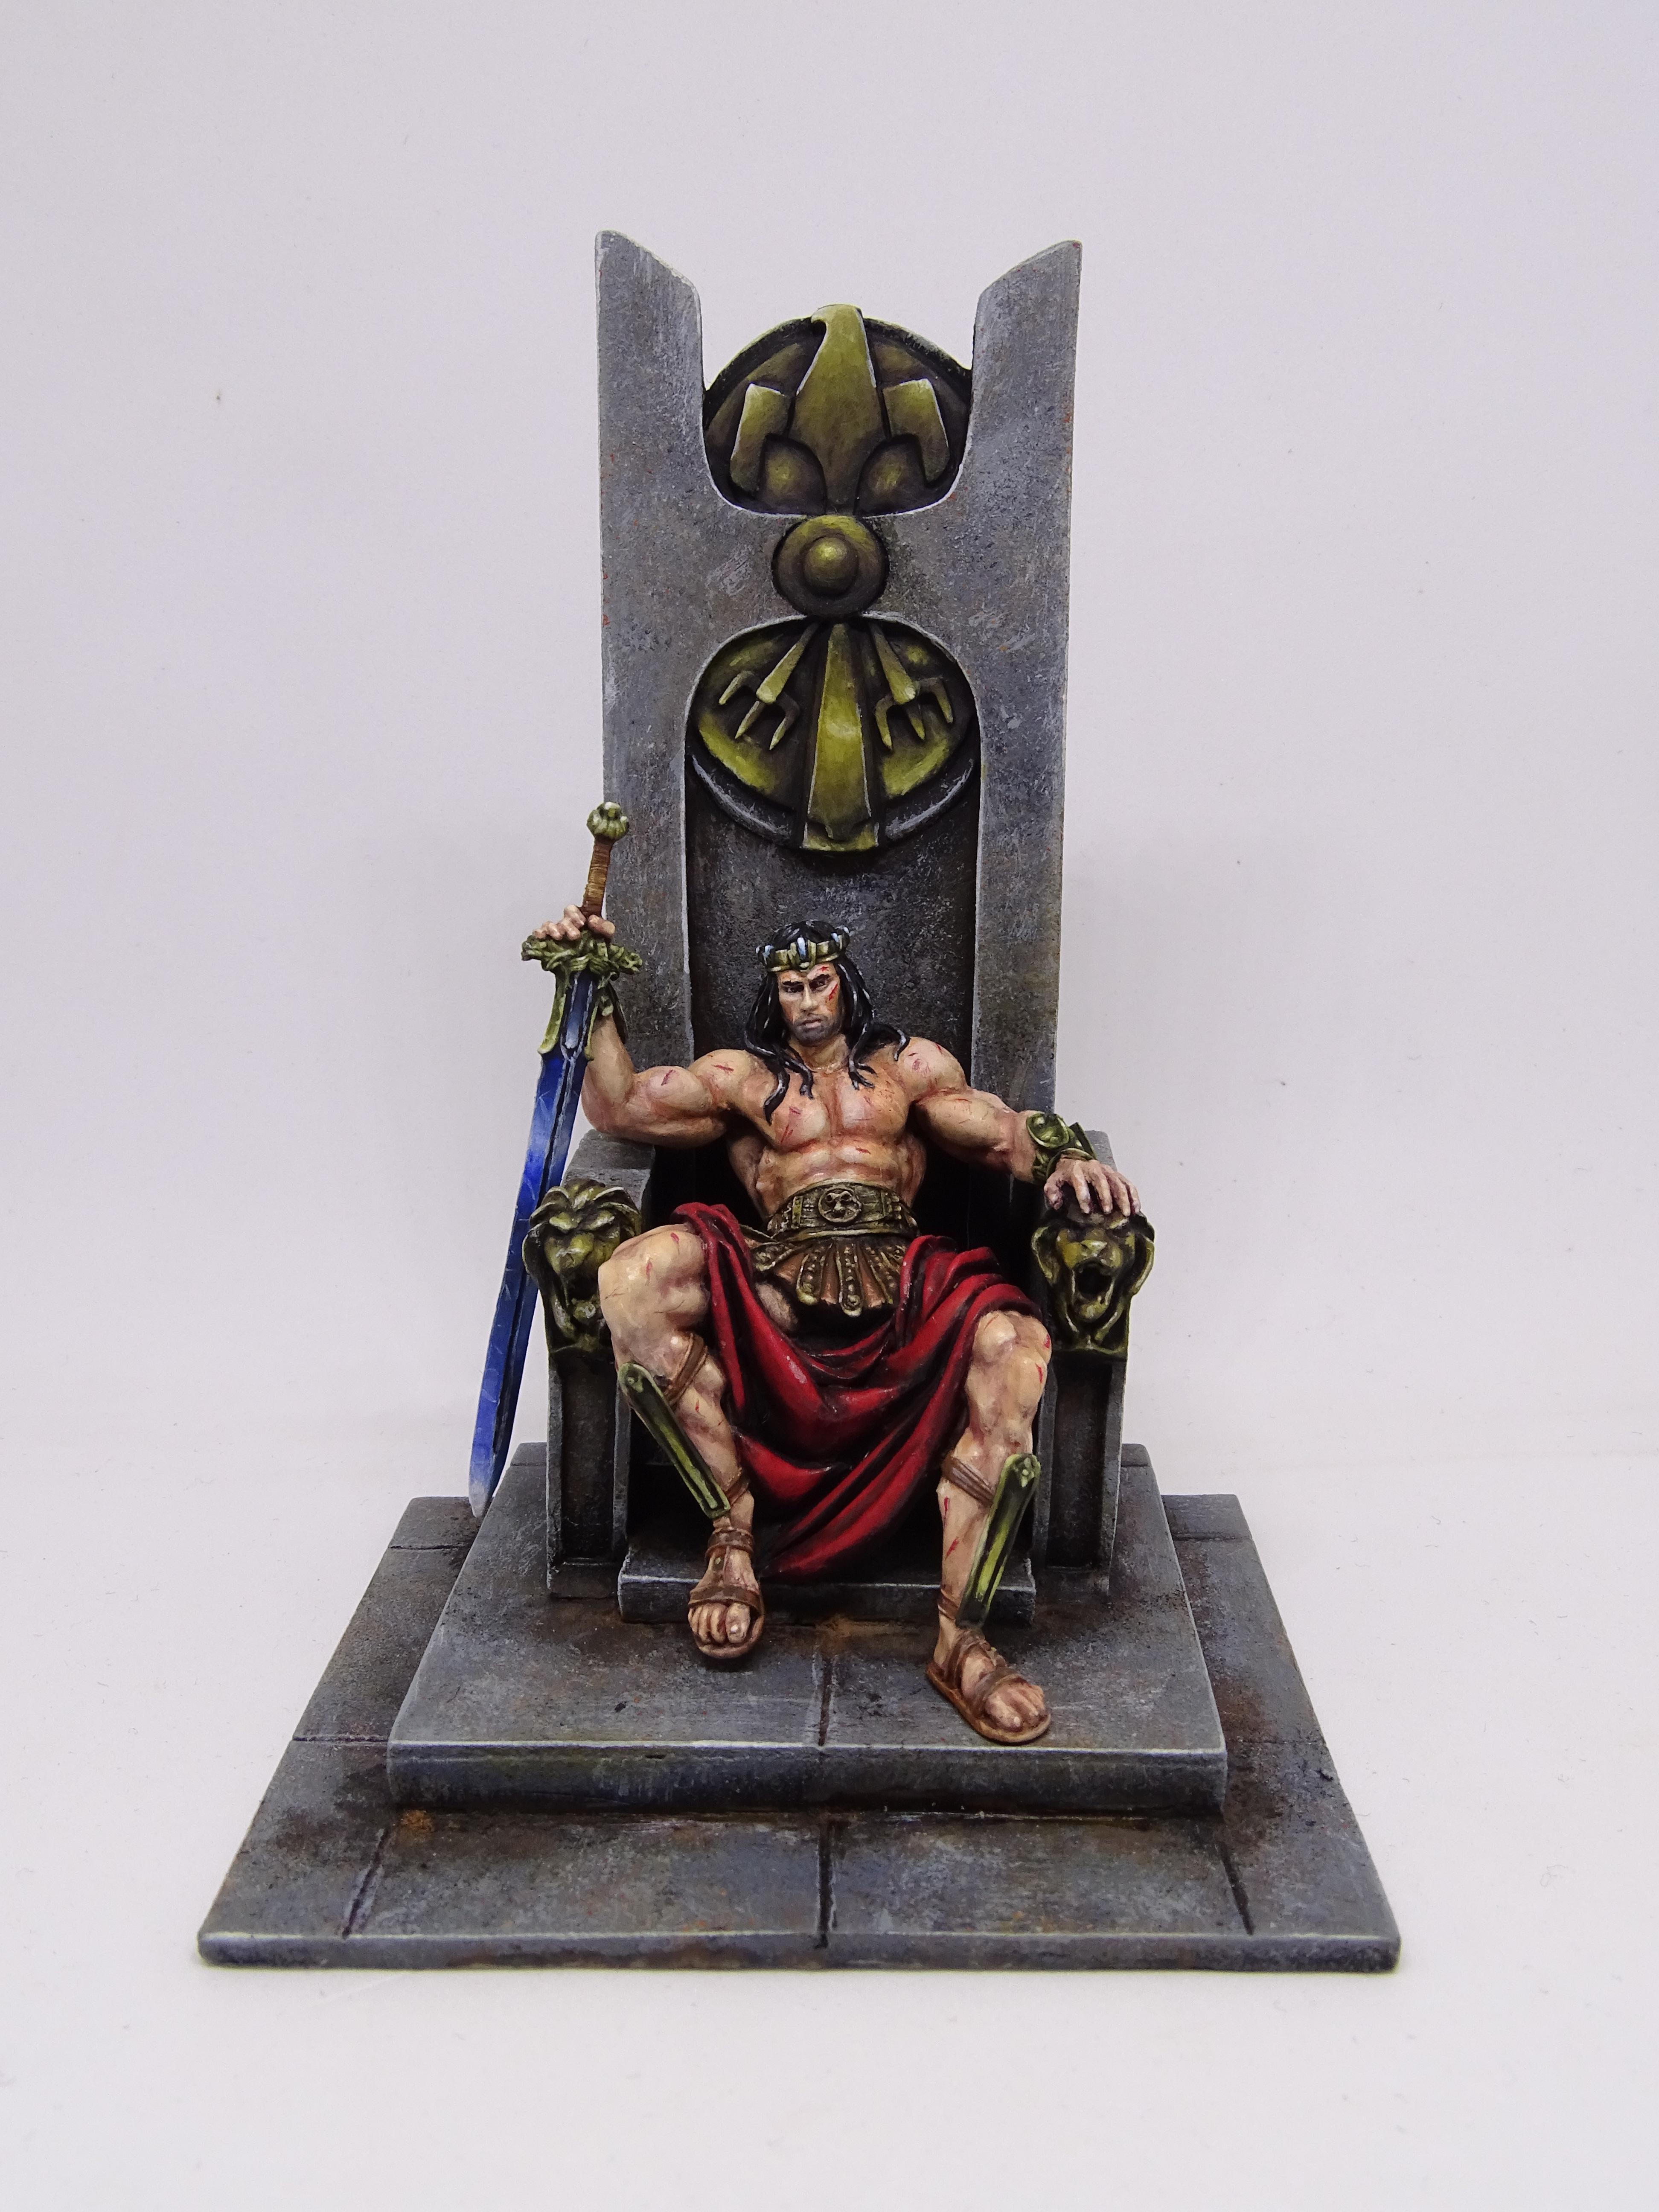 Barbarian, Conan, King, Throne